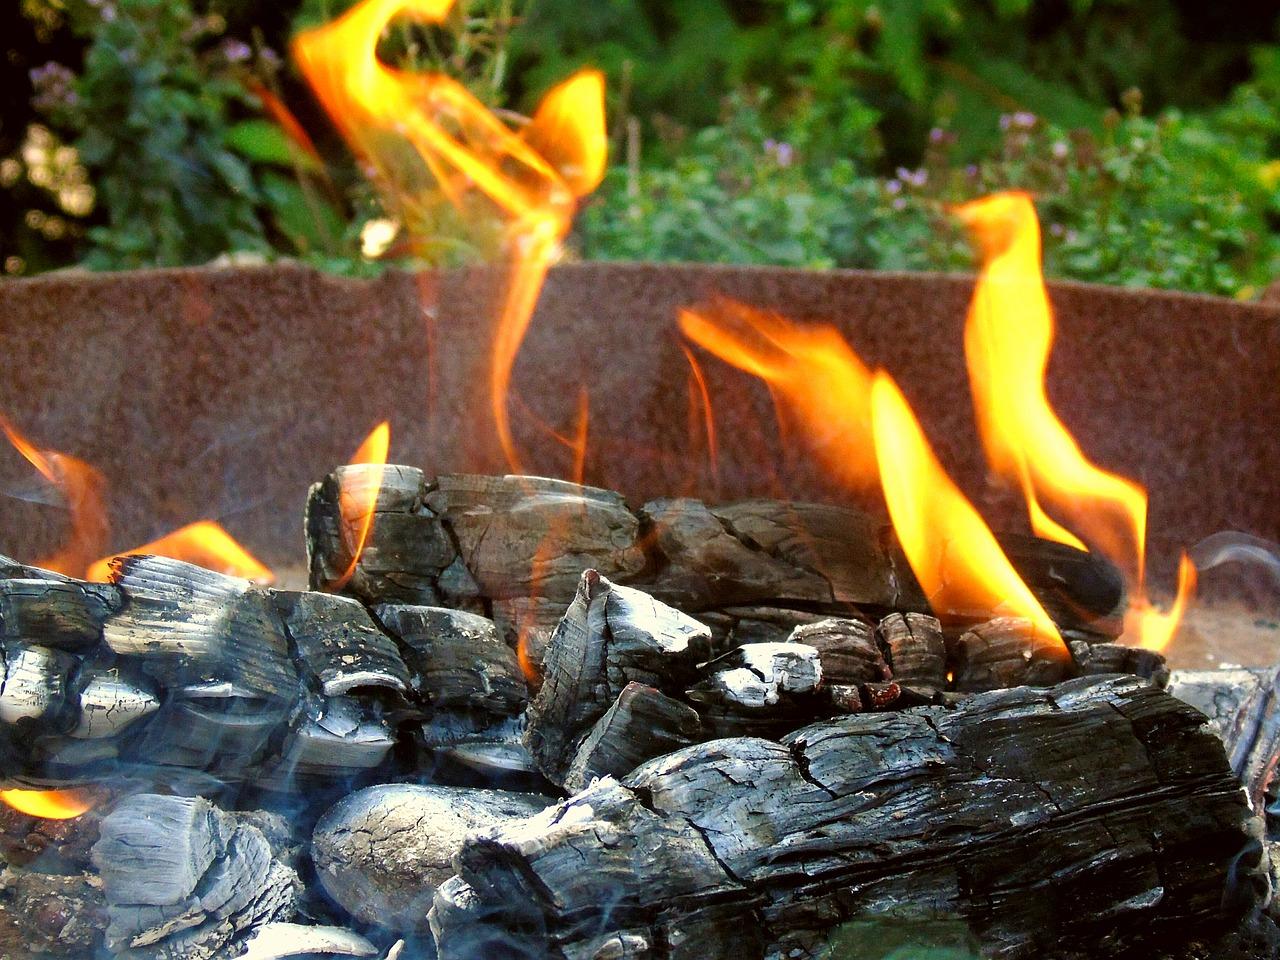 Feuerschale Feuer Flammen Garten Hitze